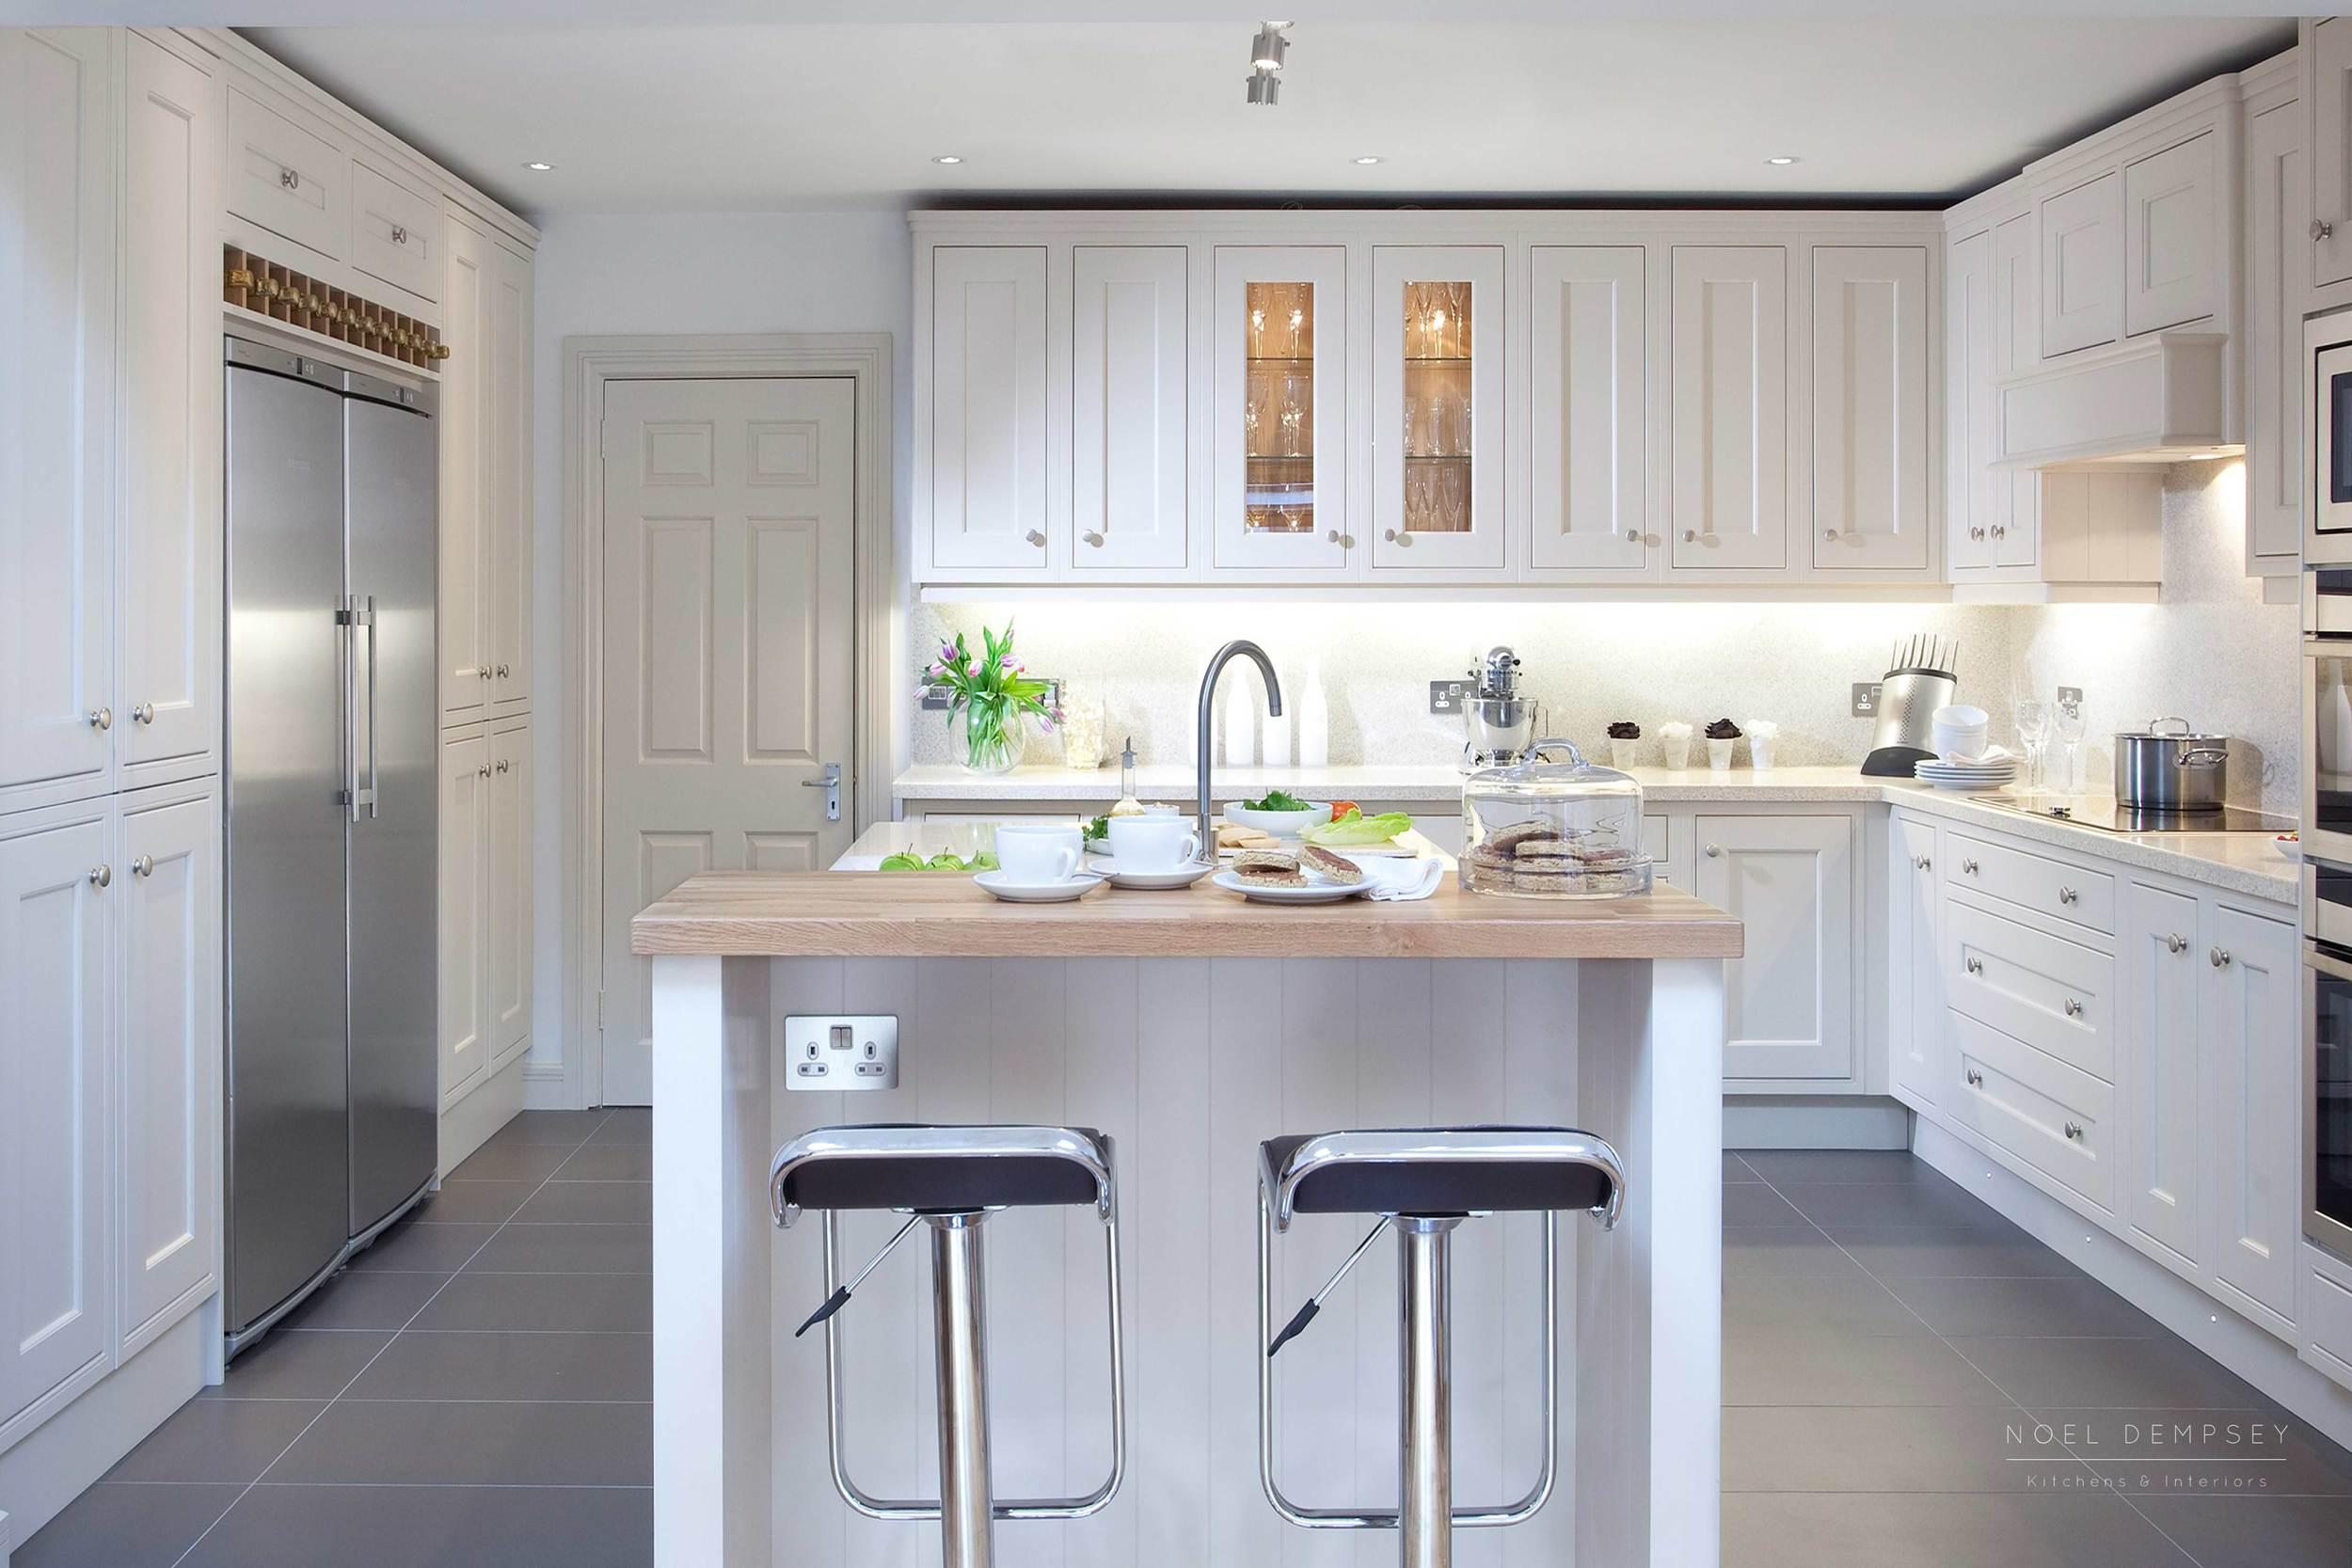 Blackrock-painted-kitchen-dublin-1.jpg